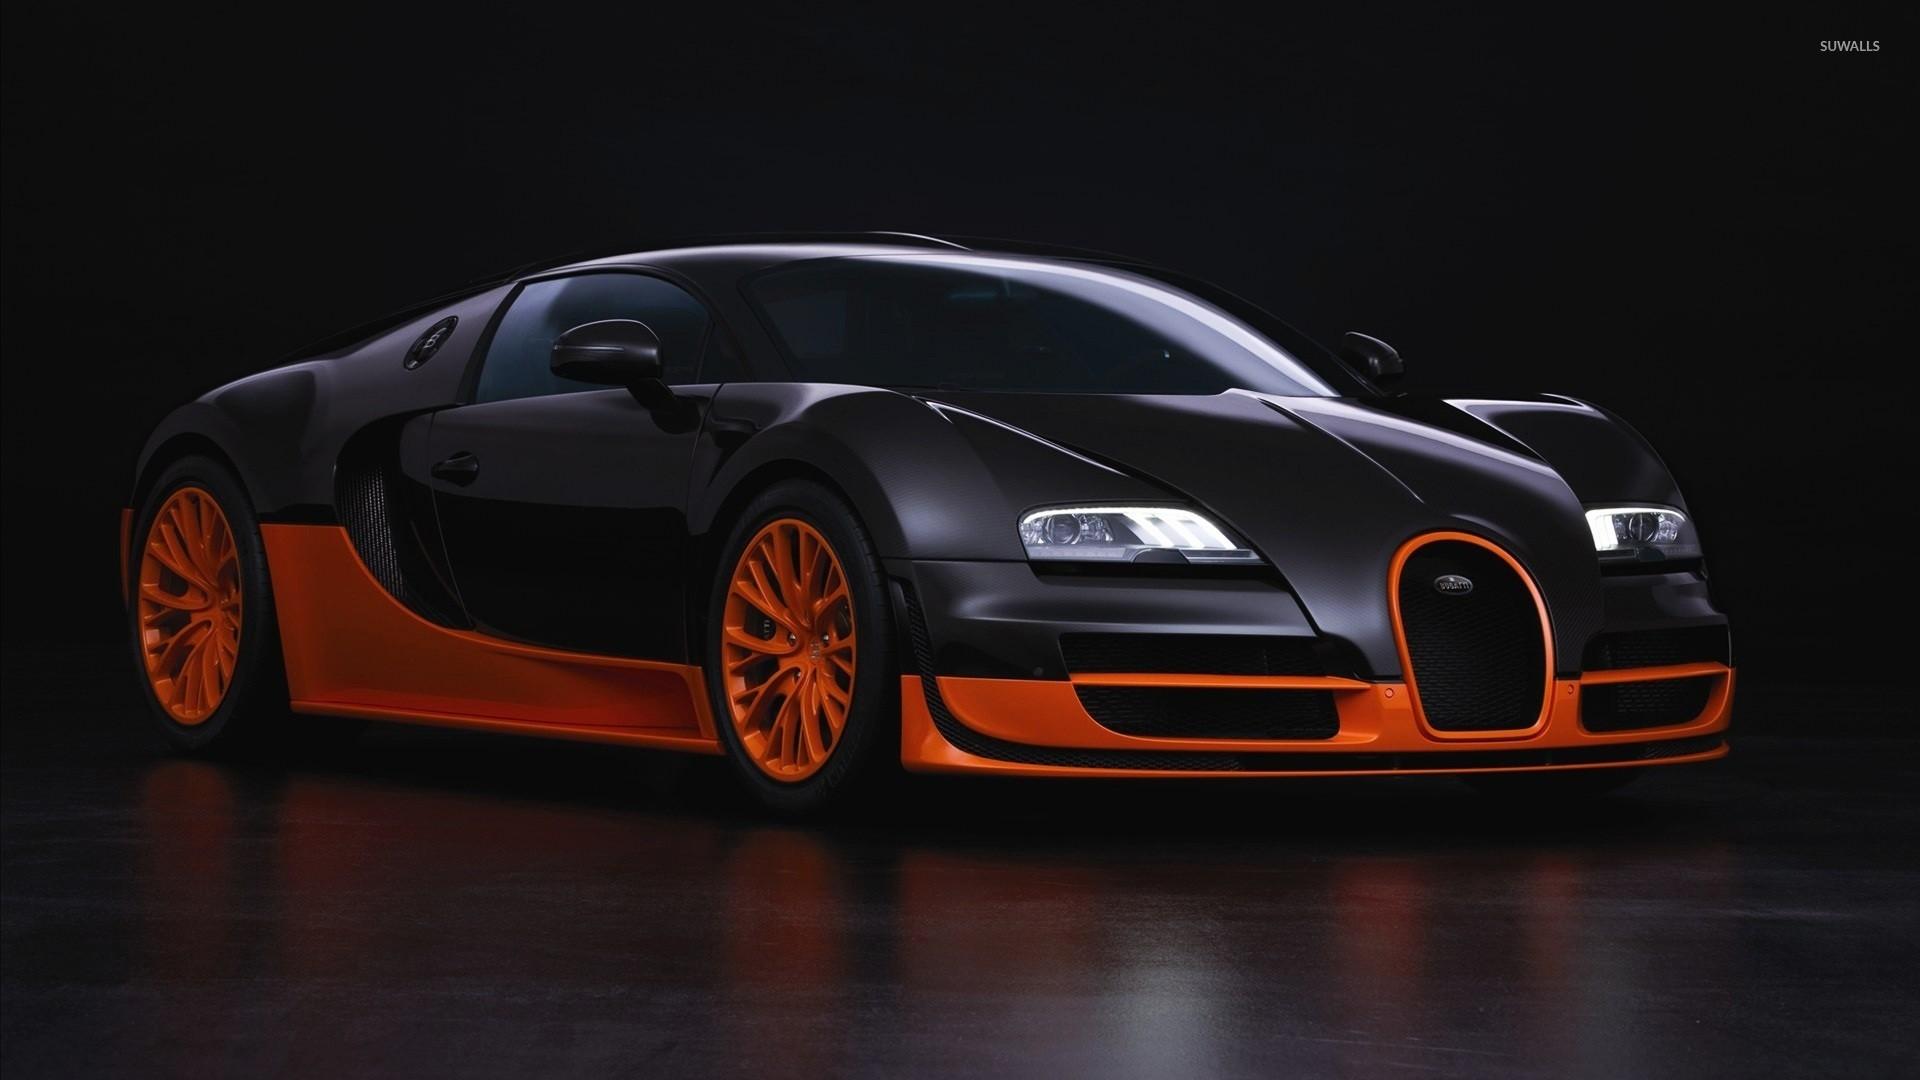 Bugatti Chiron Wallpapers 74 Images